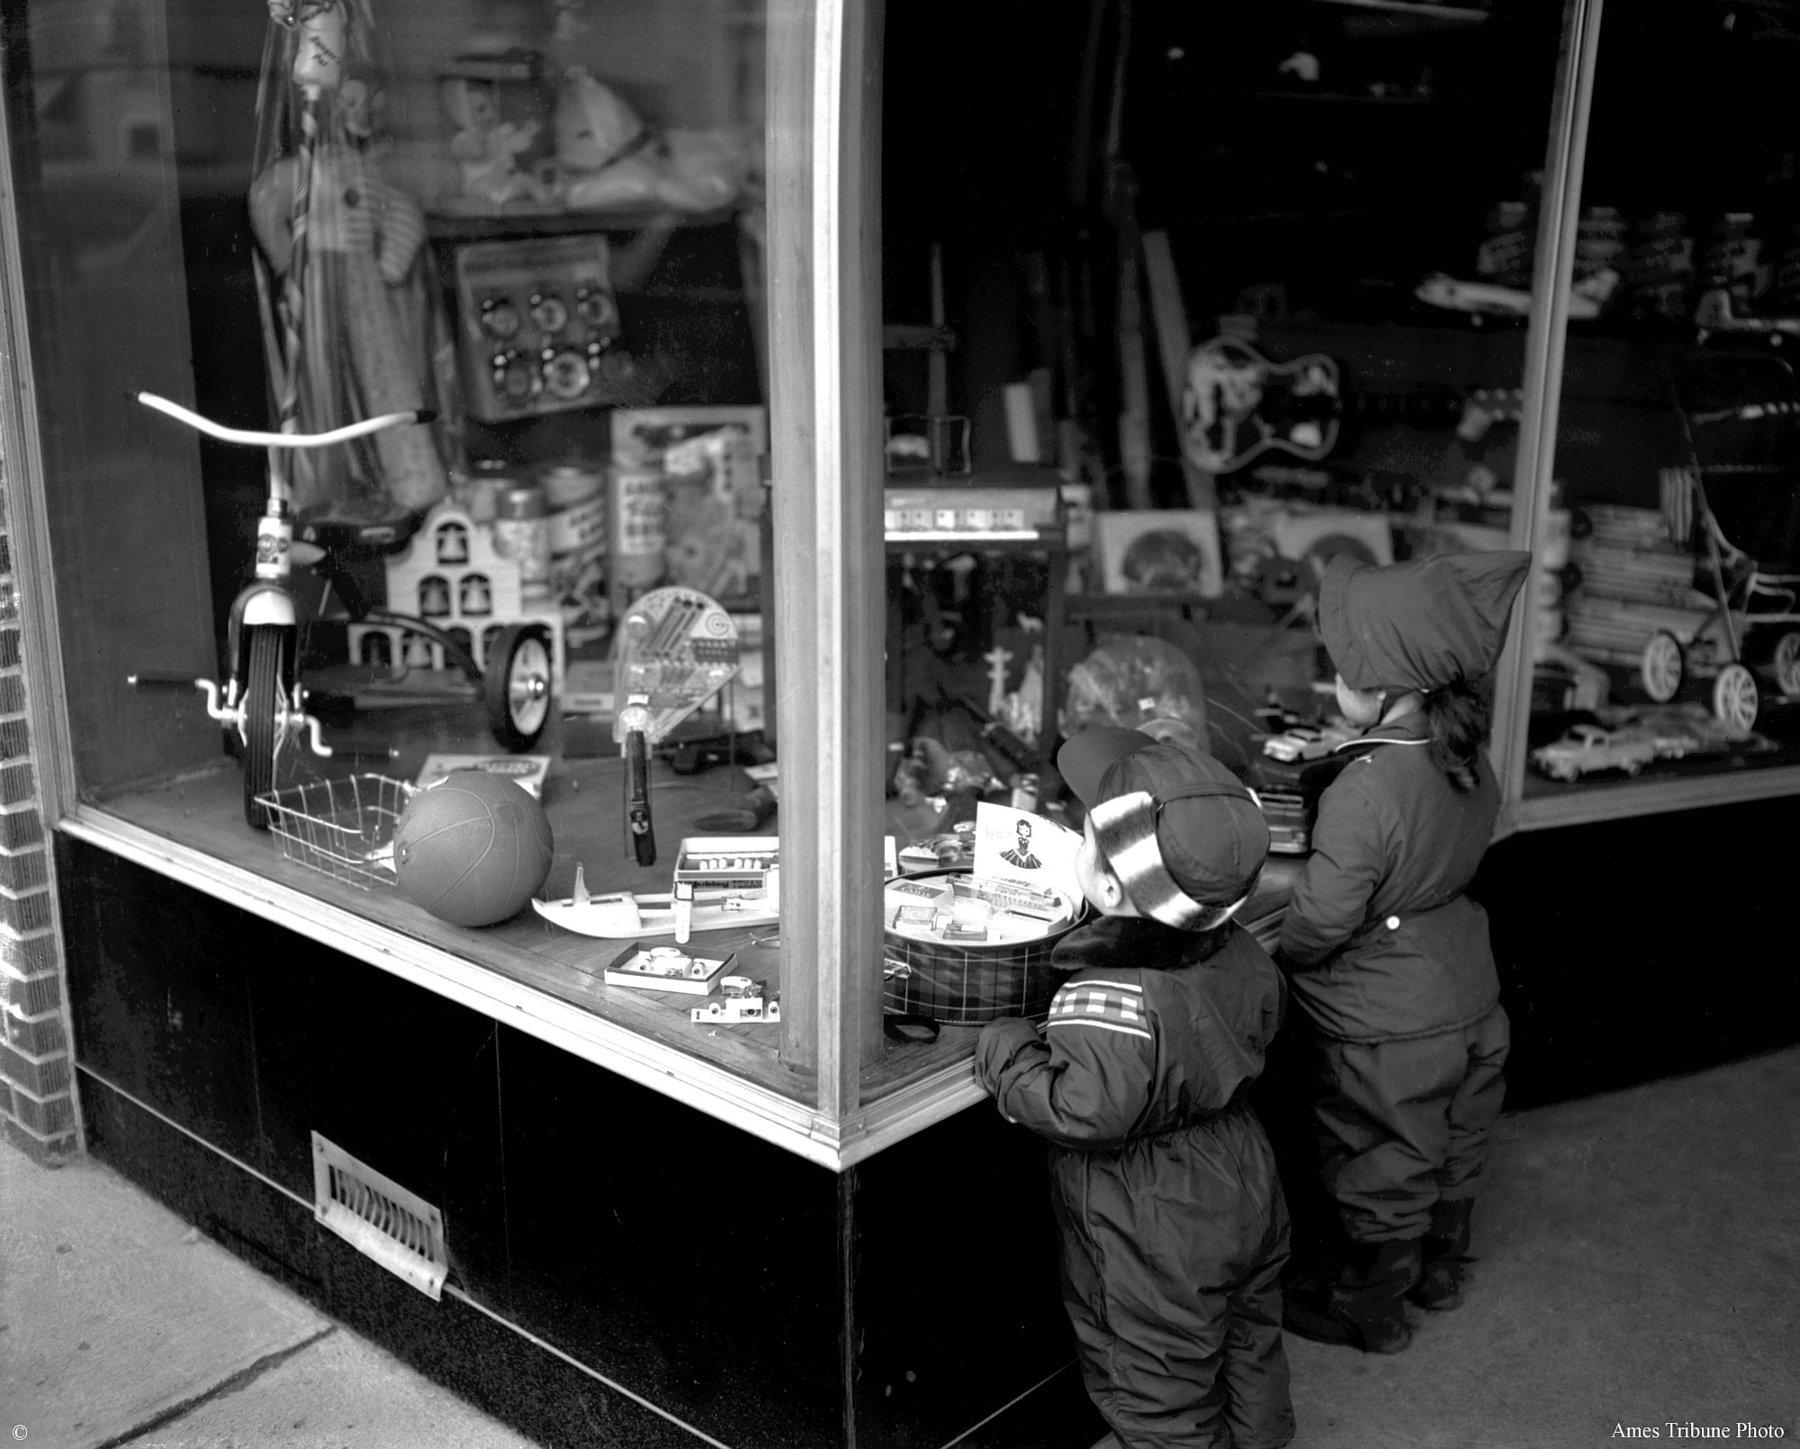 51_1957.11.27_kids_window_shopping_c.jpg